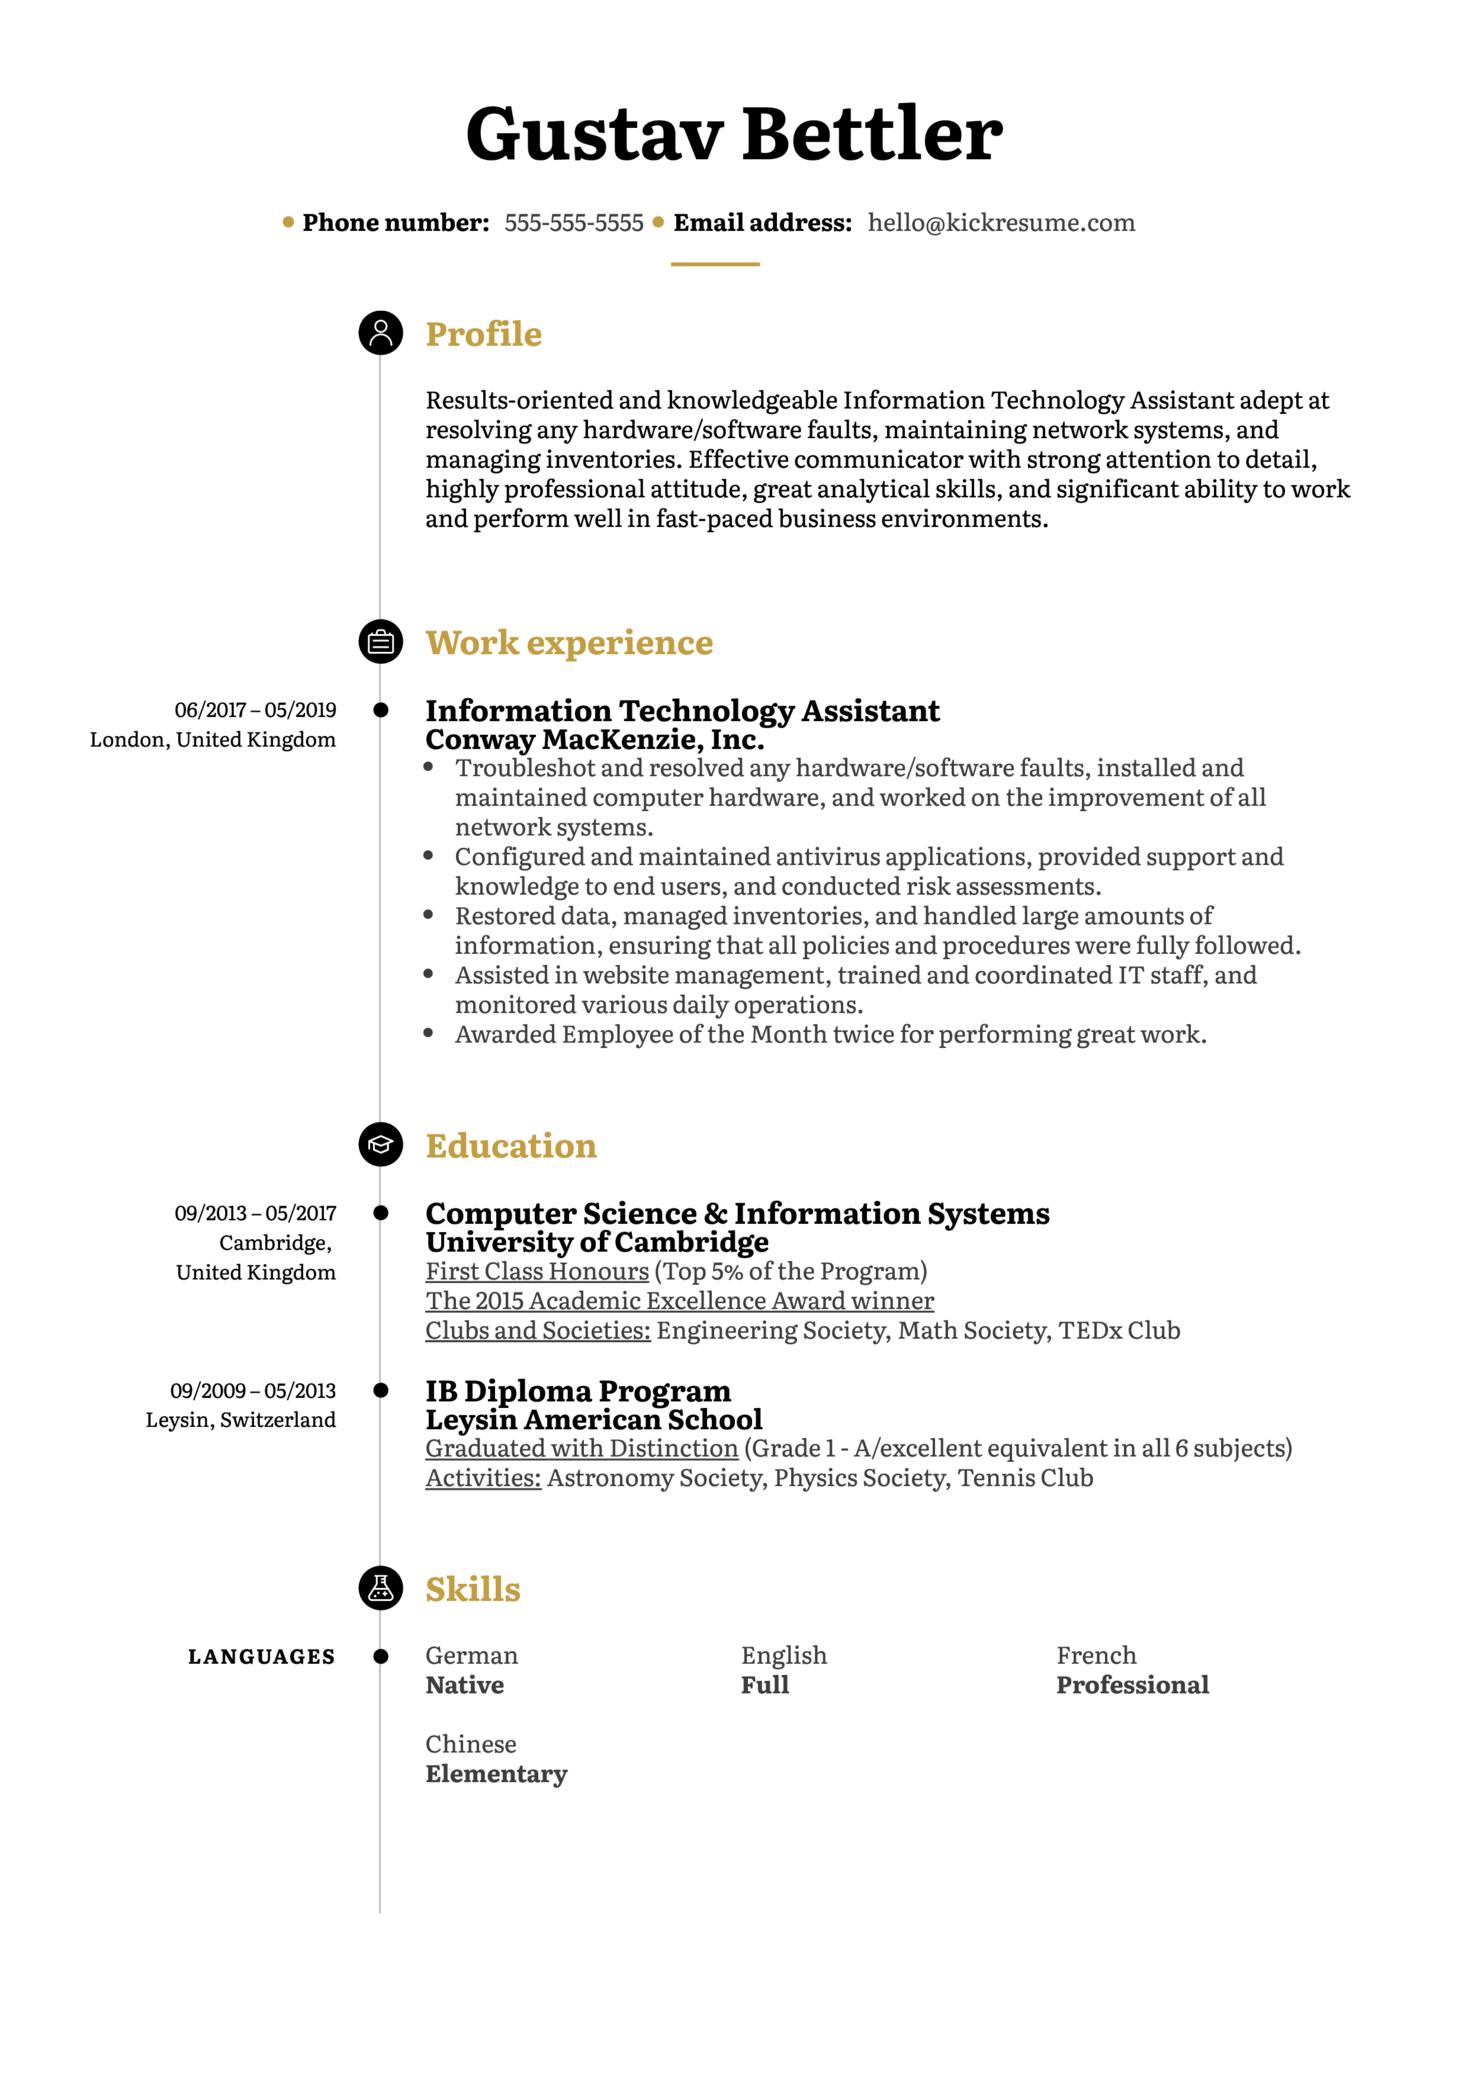 Information Technology Assistant Resume Sample (Part 1)